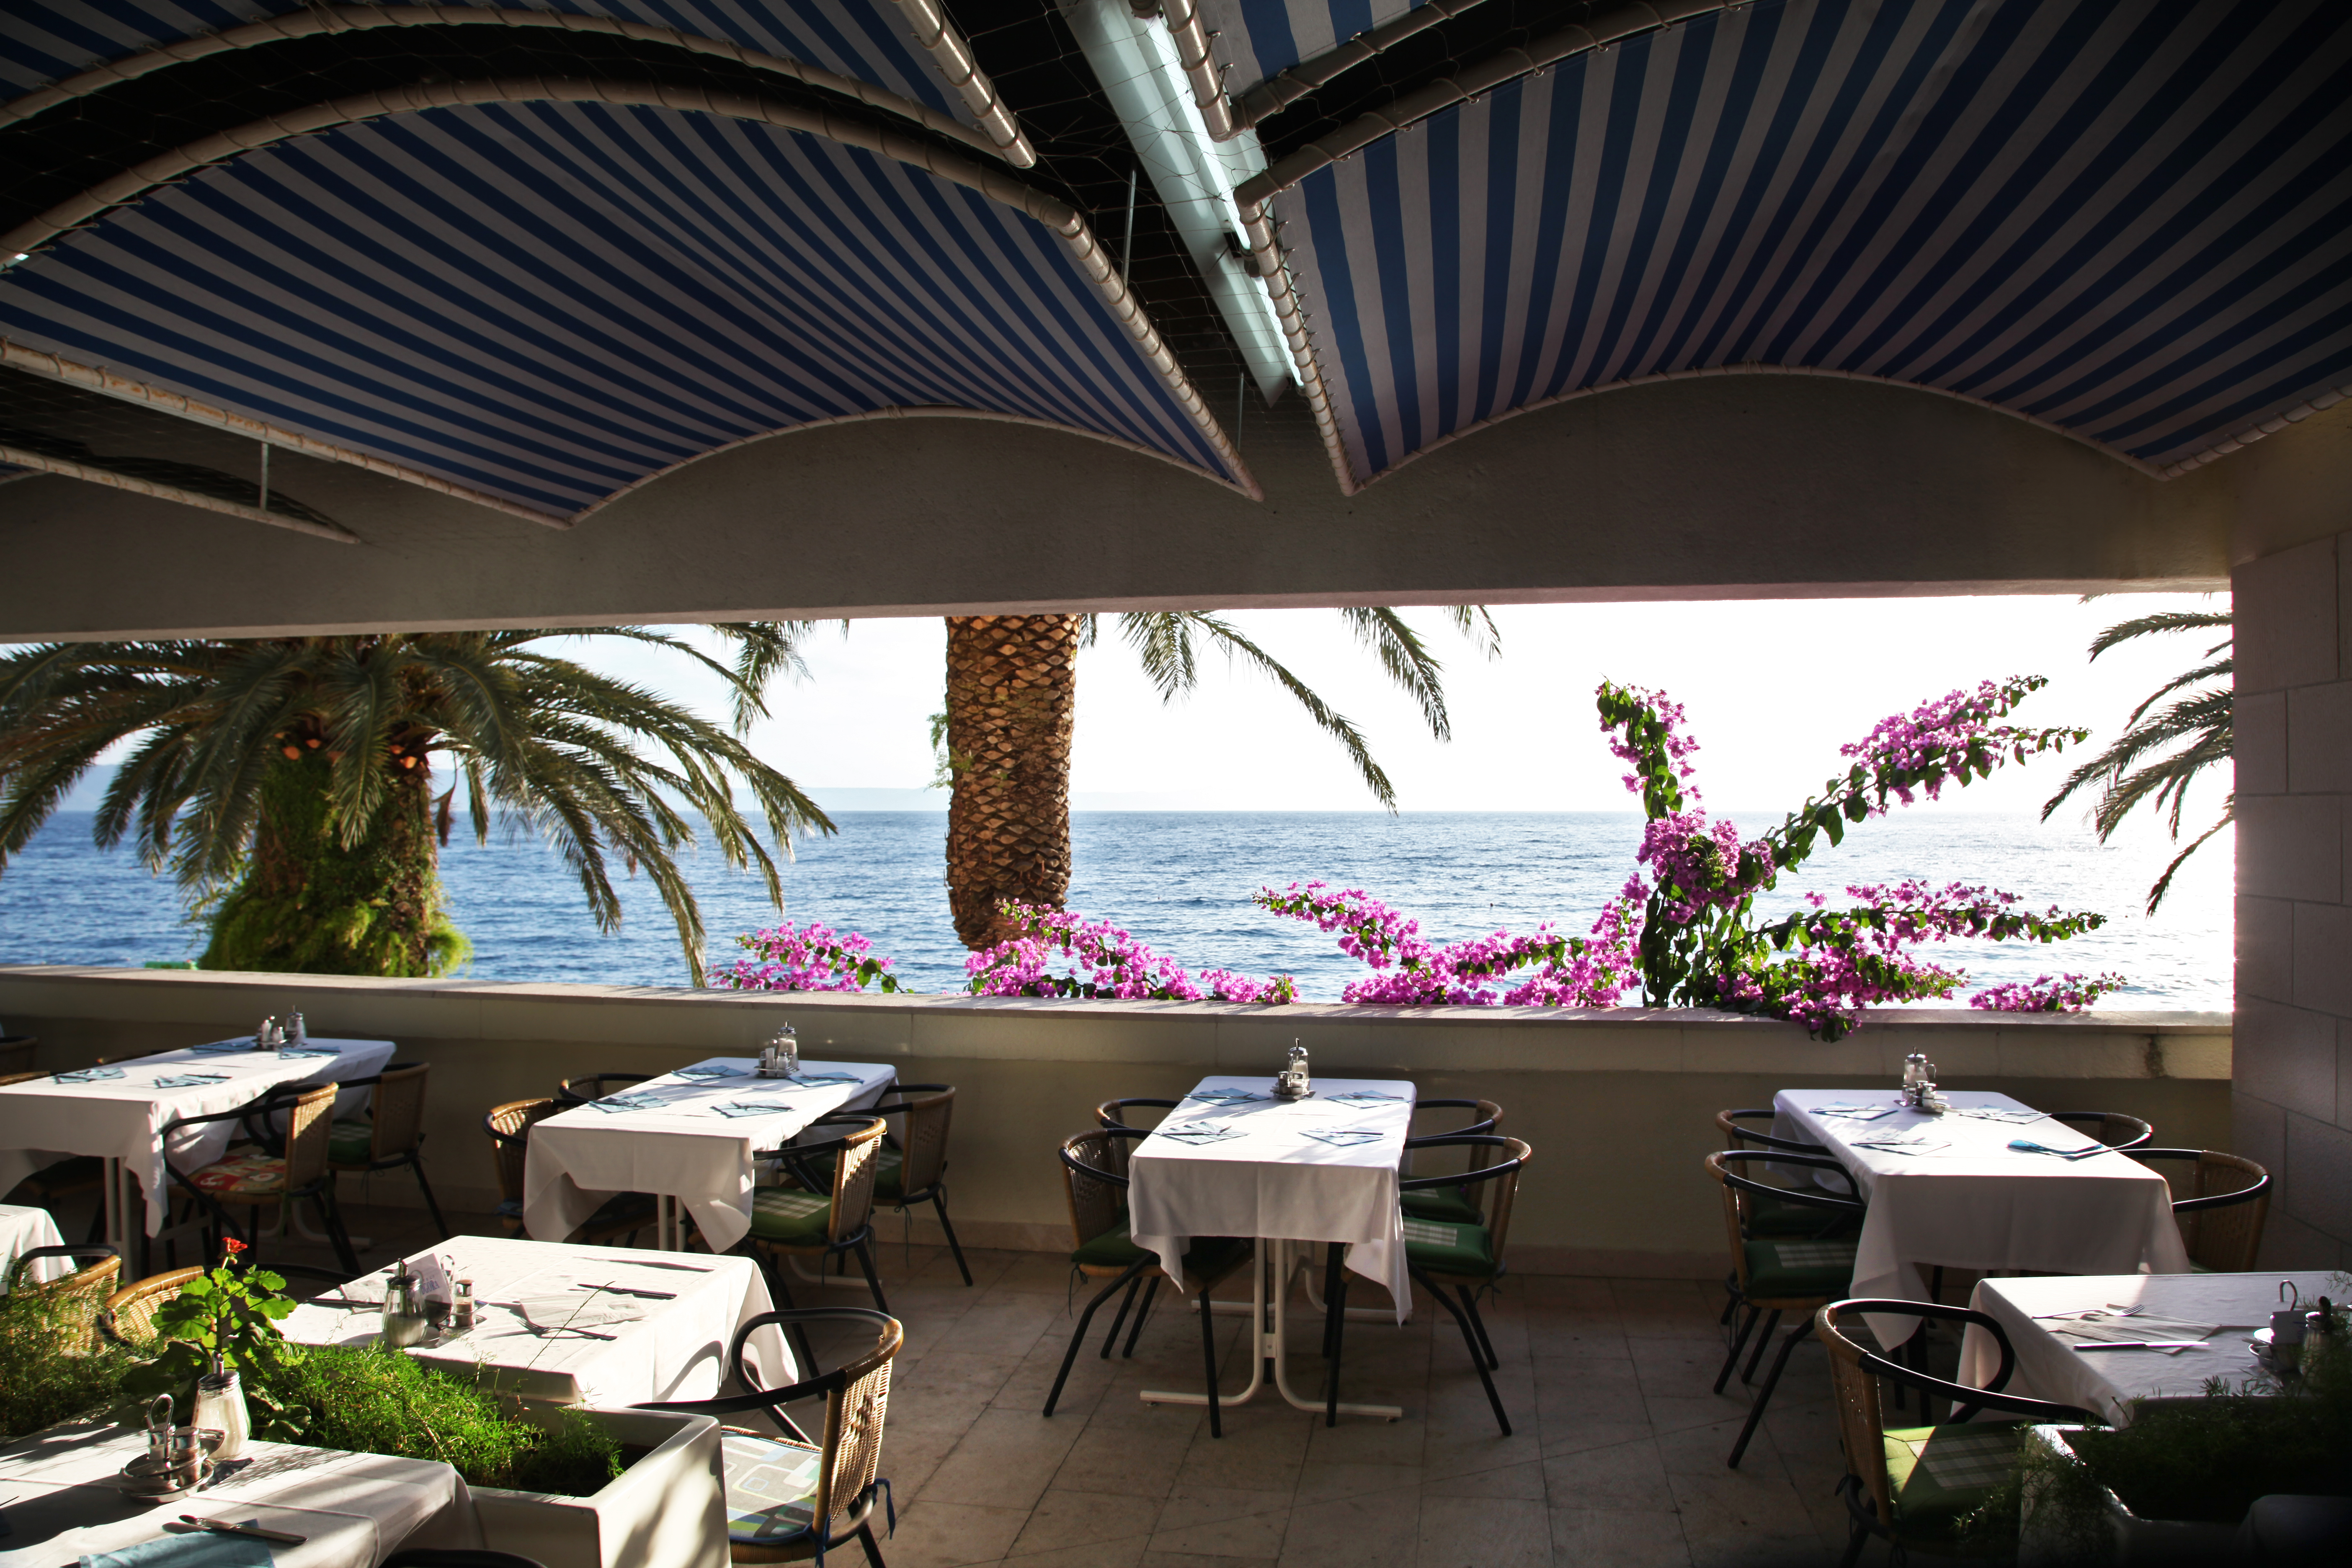 Hotel Podgorka_restaurant terrace